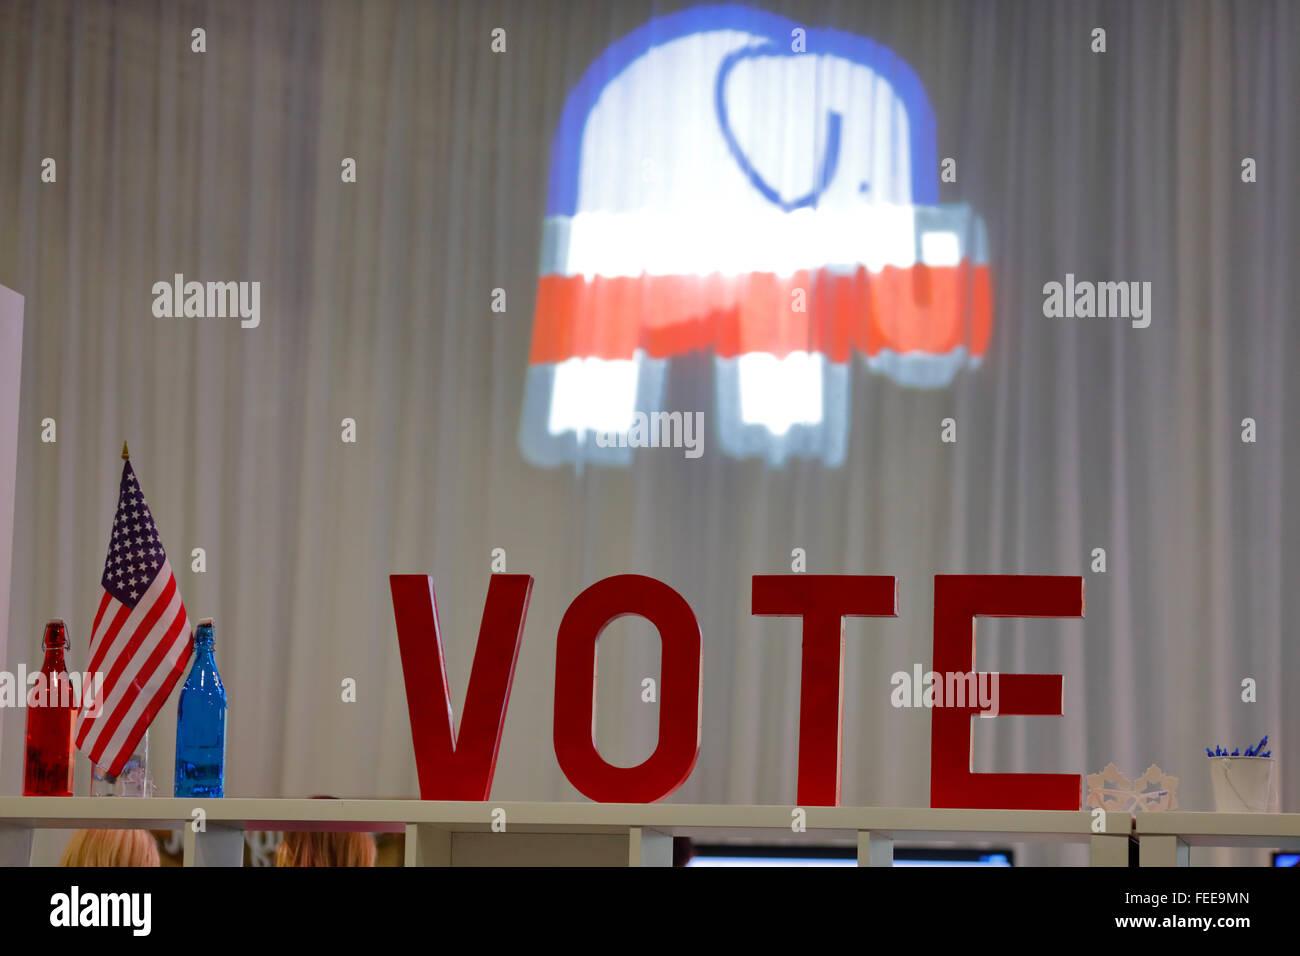 LAS VEGAS, NV - DEC, 15, 2015: Republican CNN presidential debate at The Venetian Casino shows Vote Sign and Republican - Stock Image